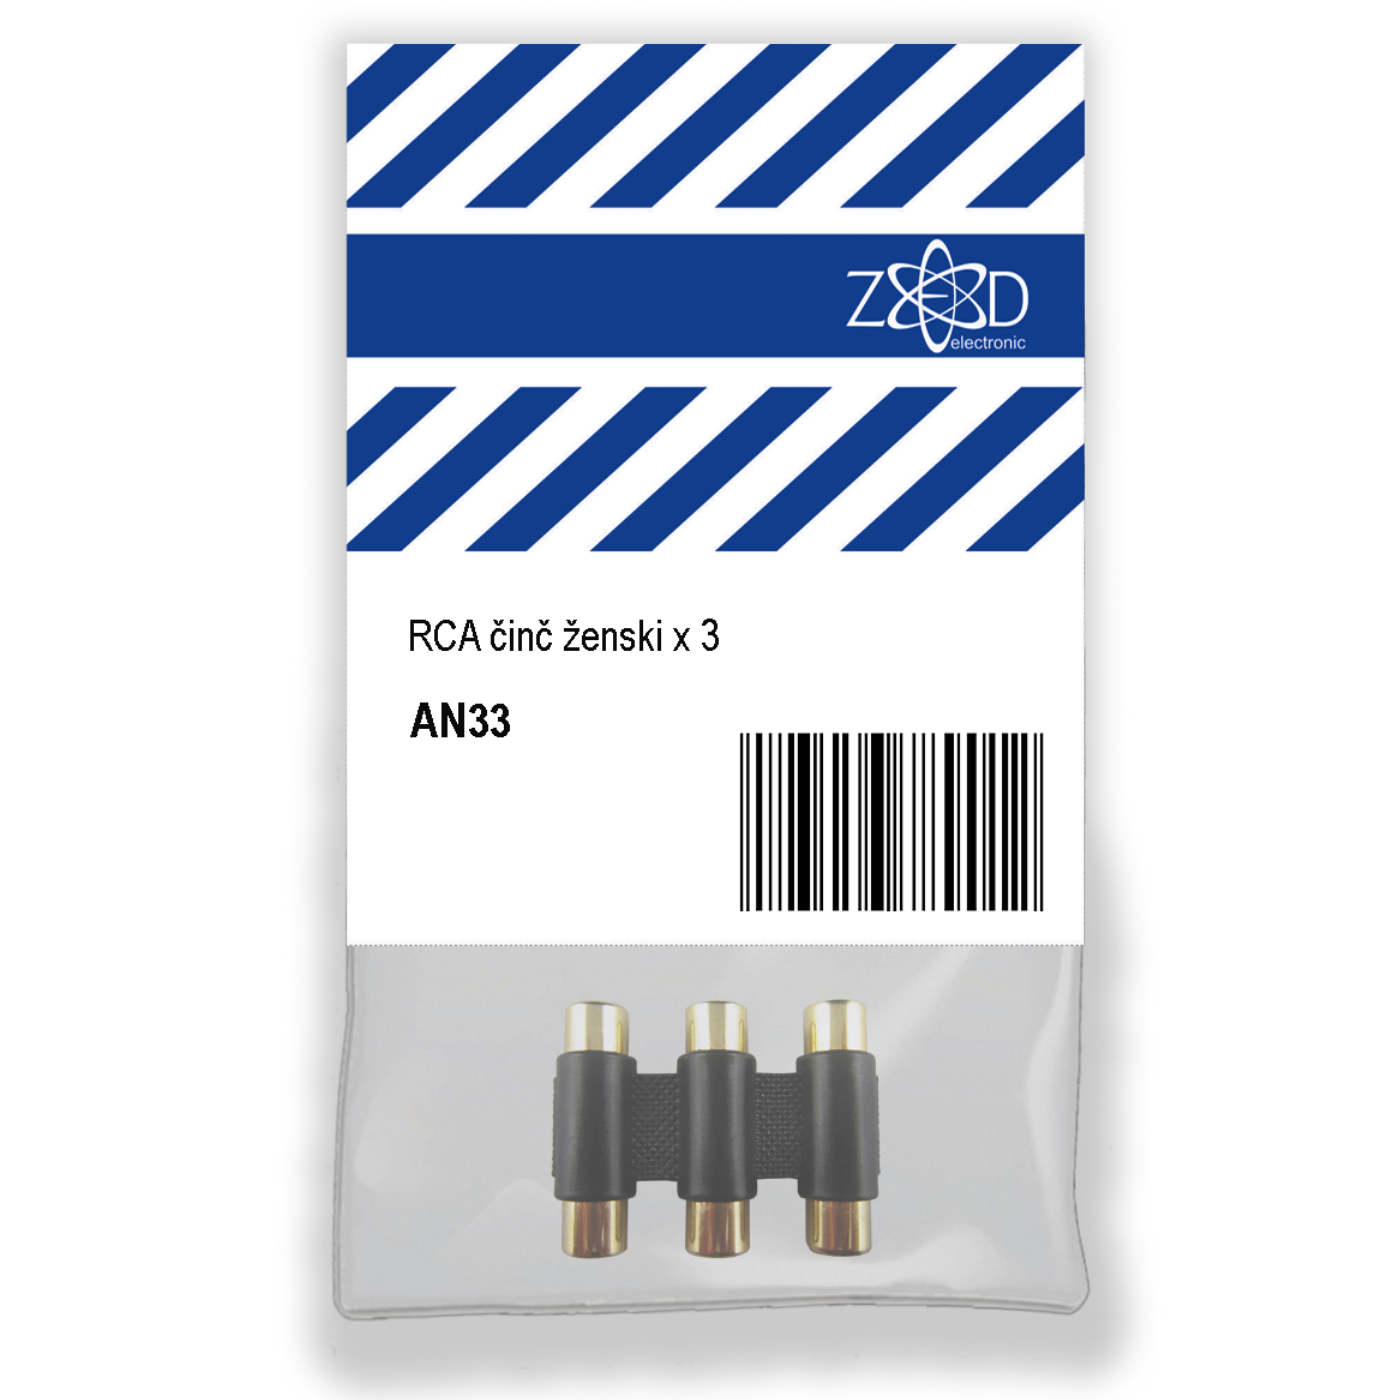 ZED electronic - AN33